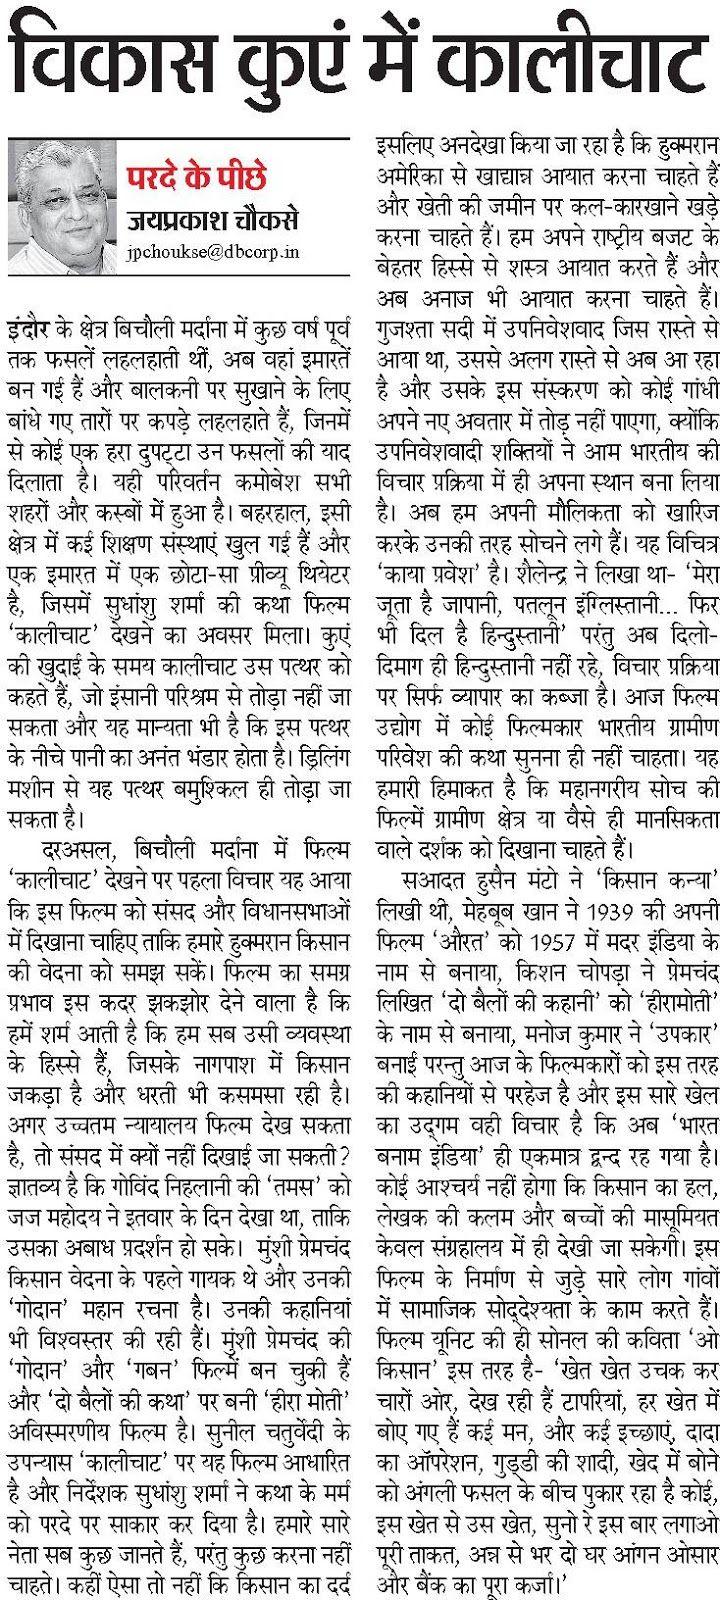 "Kalichaat, जयप्रकाश चौकसे - परदे के पीछे ""Jaiprakash Chowksey"